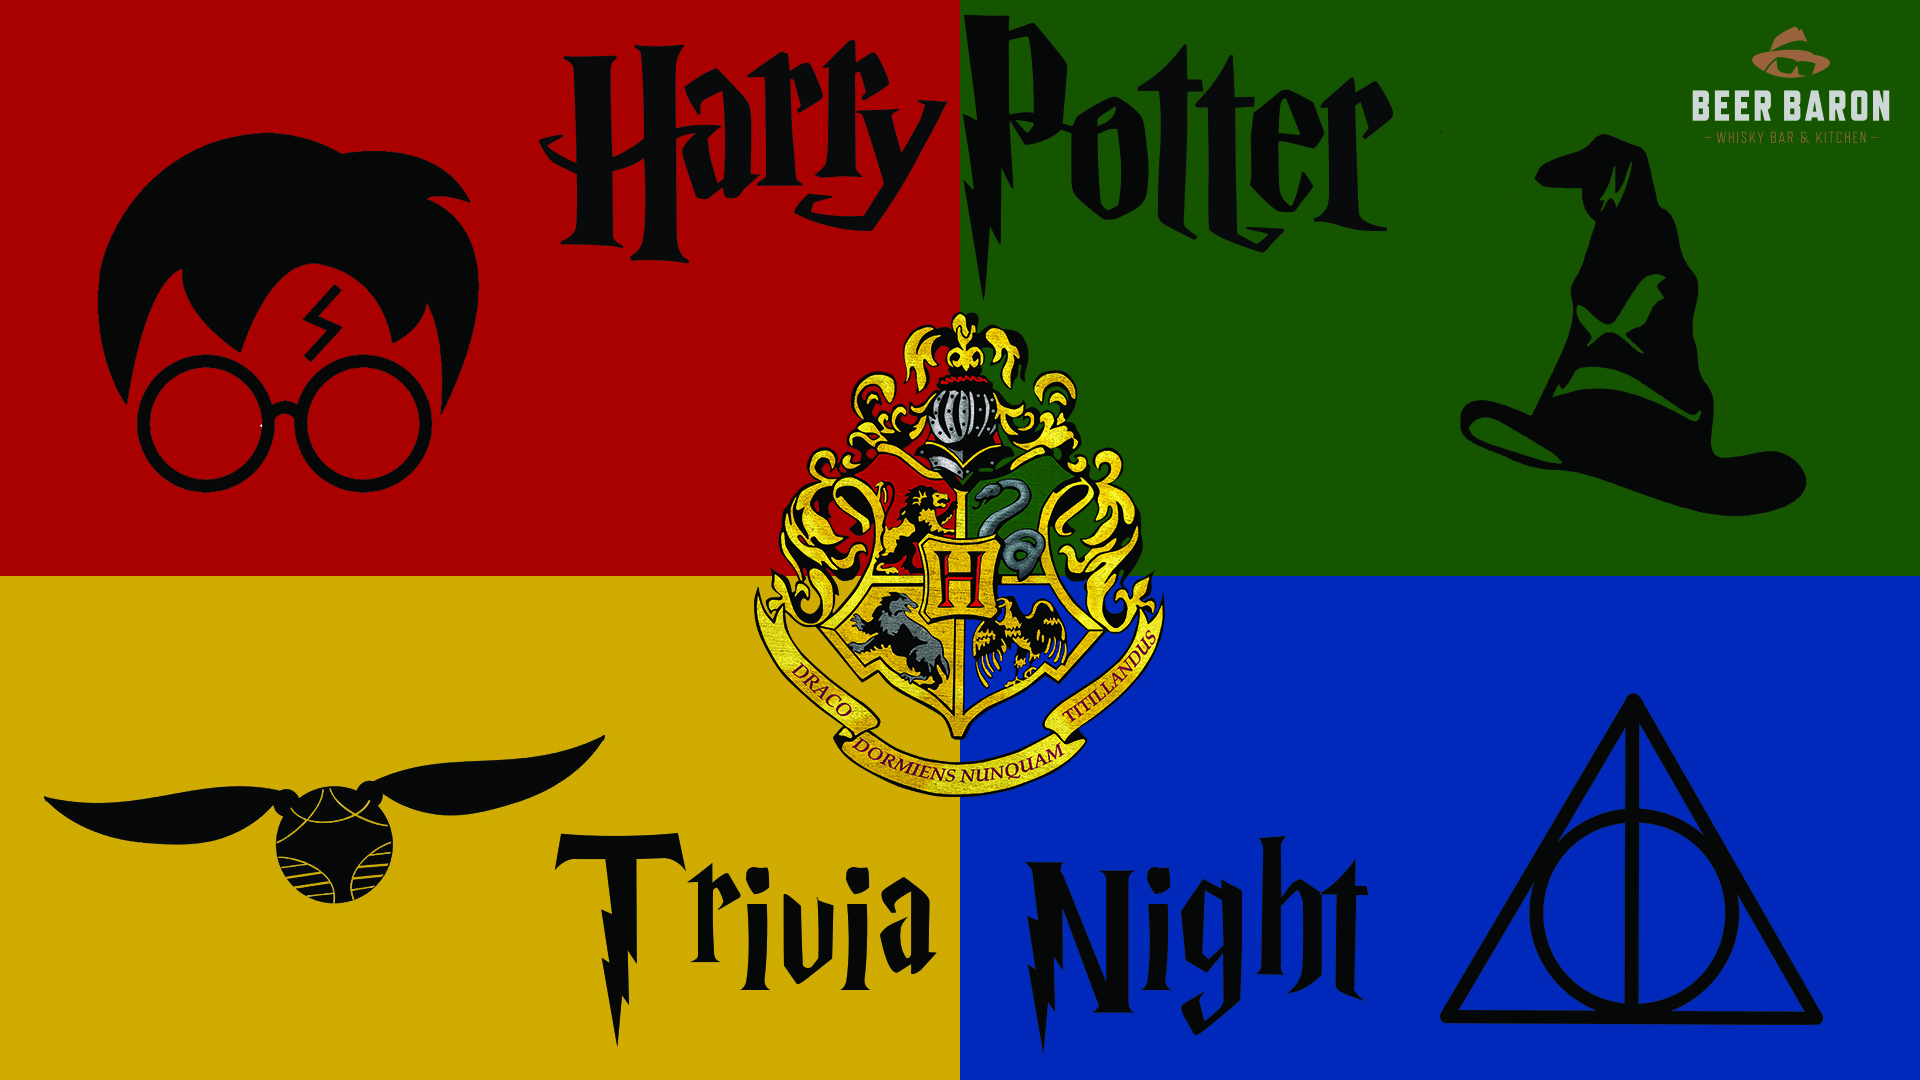 Harry Potter Cover Photo.jpg